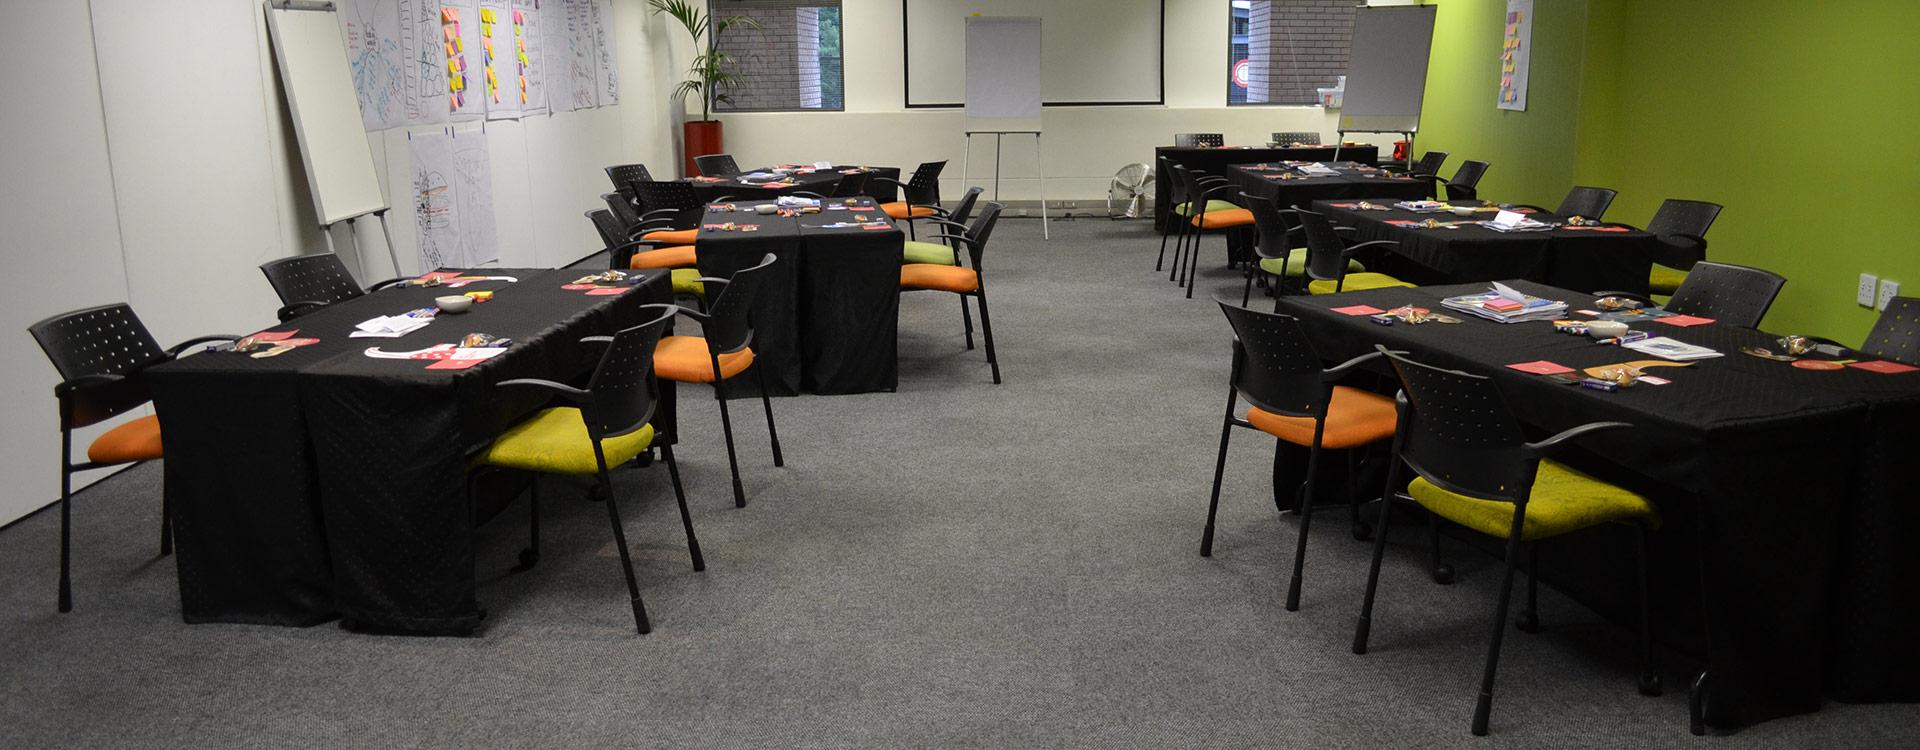 Enterprise Room - Training Room and Meetings   Focus Rooms